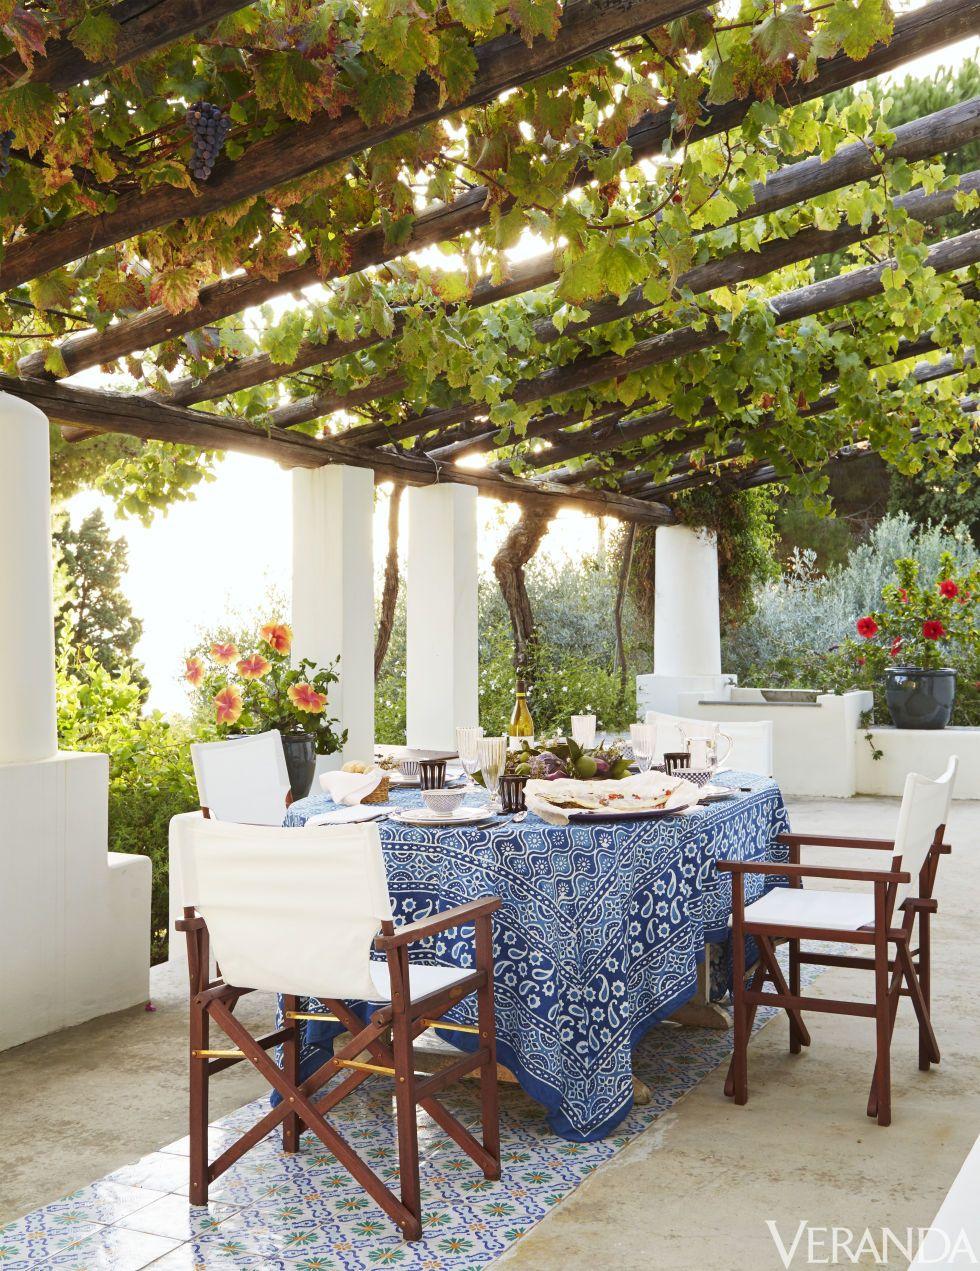 house tour a magical italian villa stuns inside and out sonnenschutz. Black Bedroom Furniture Sets. Home Design Ideas